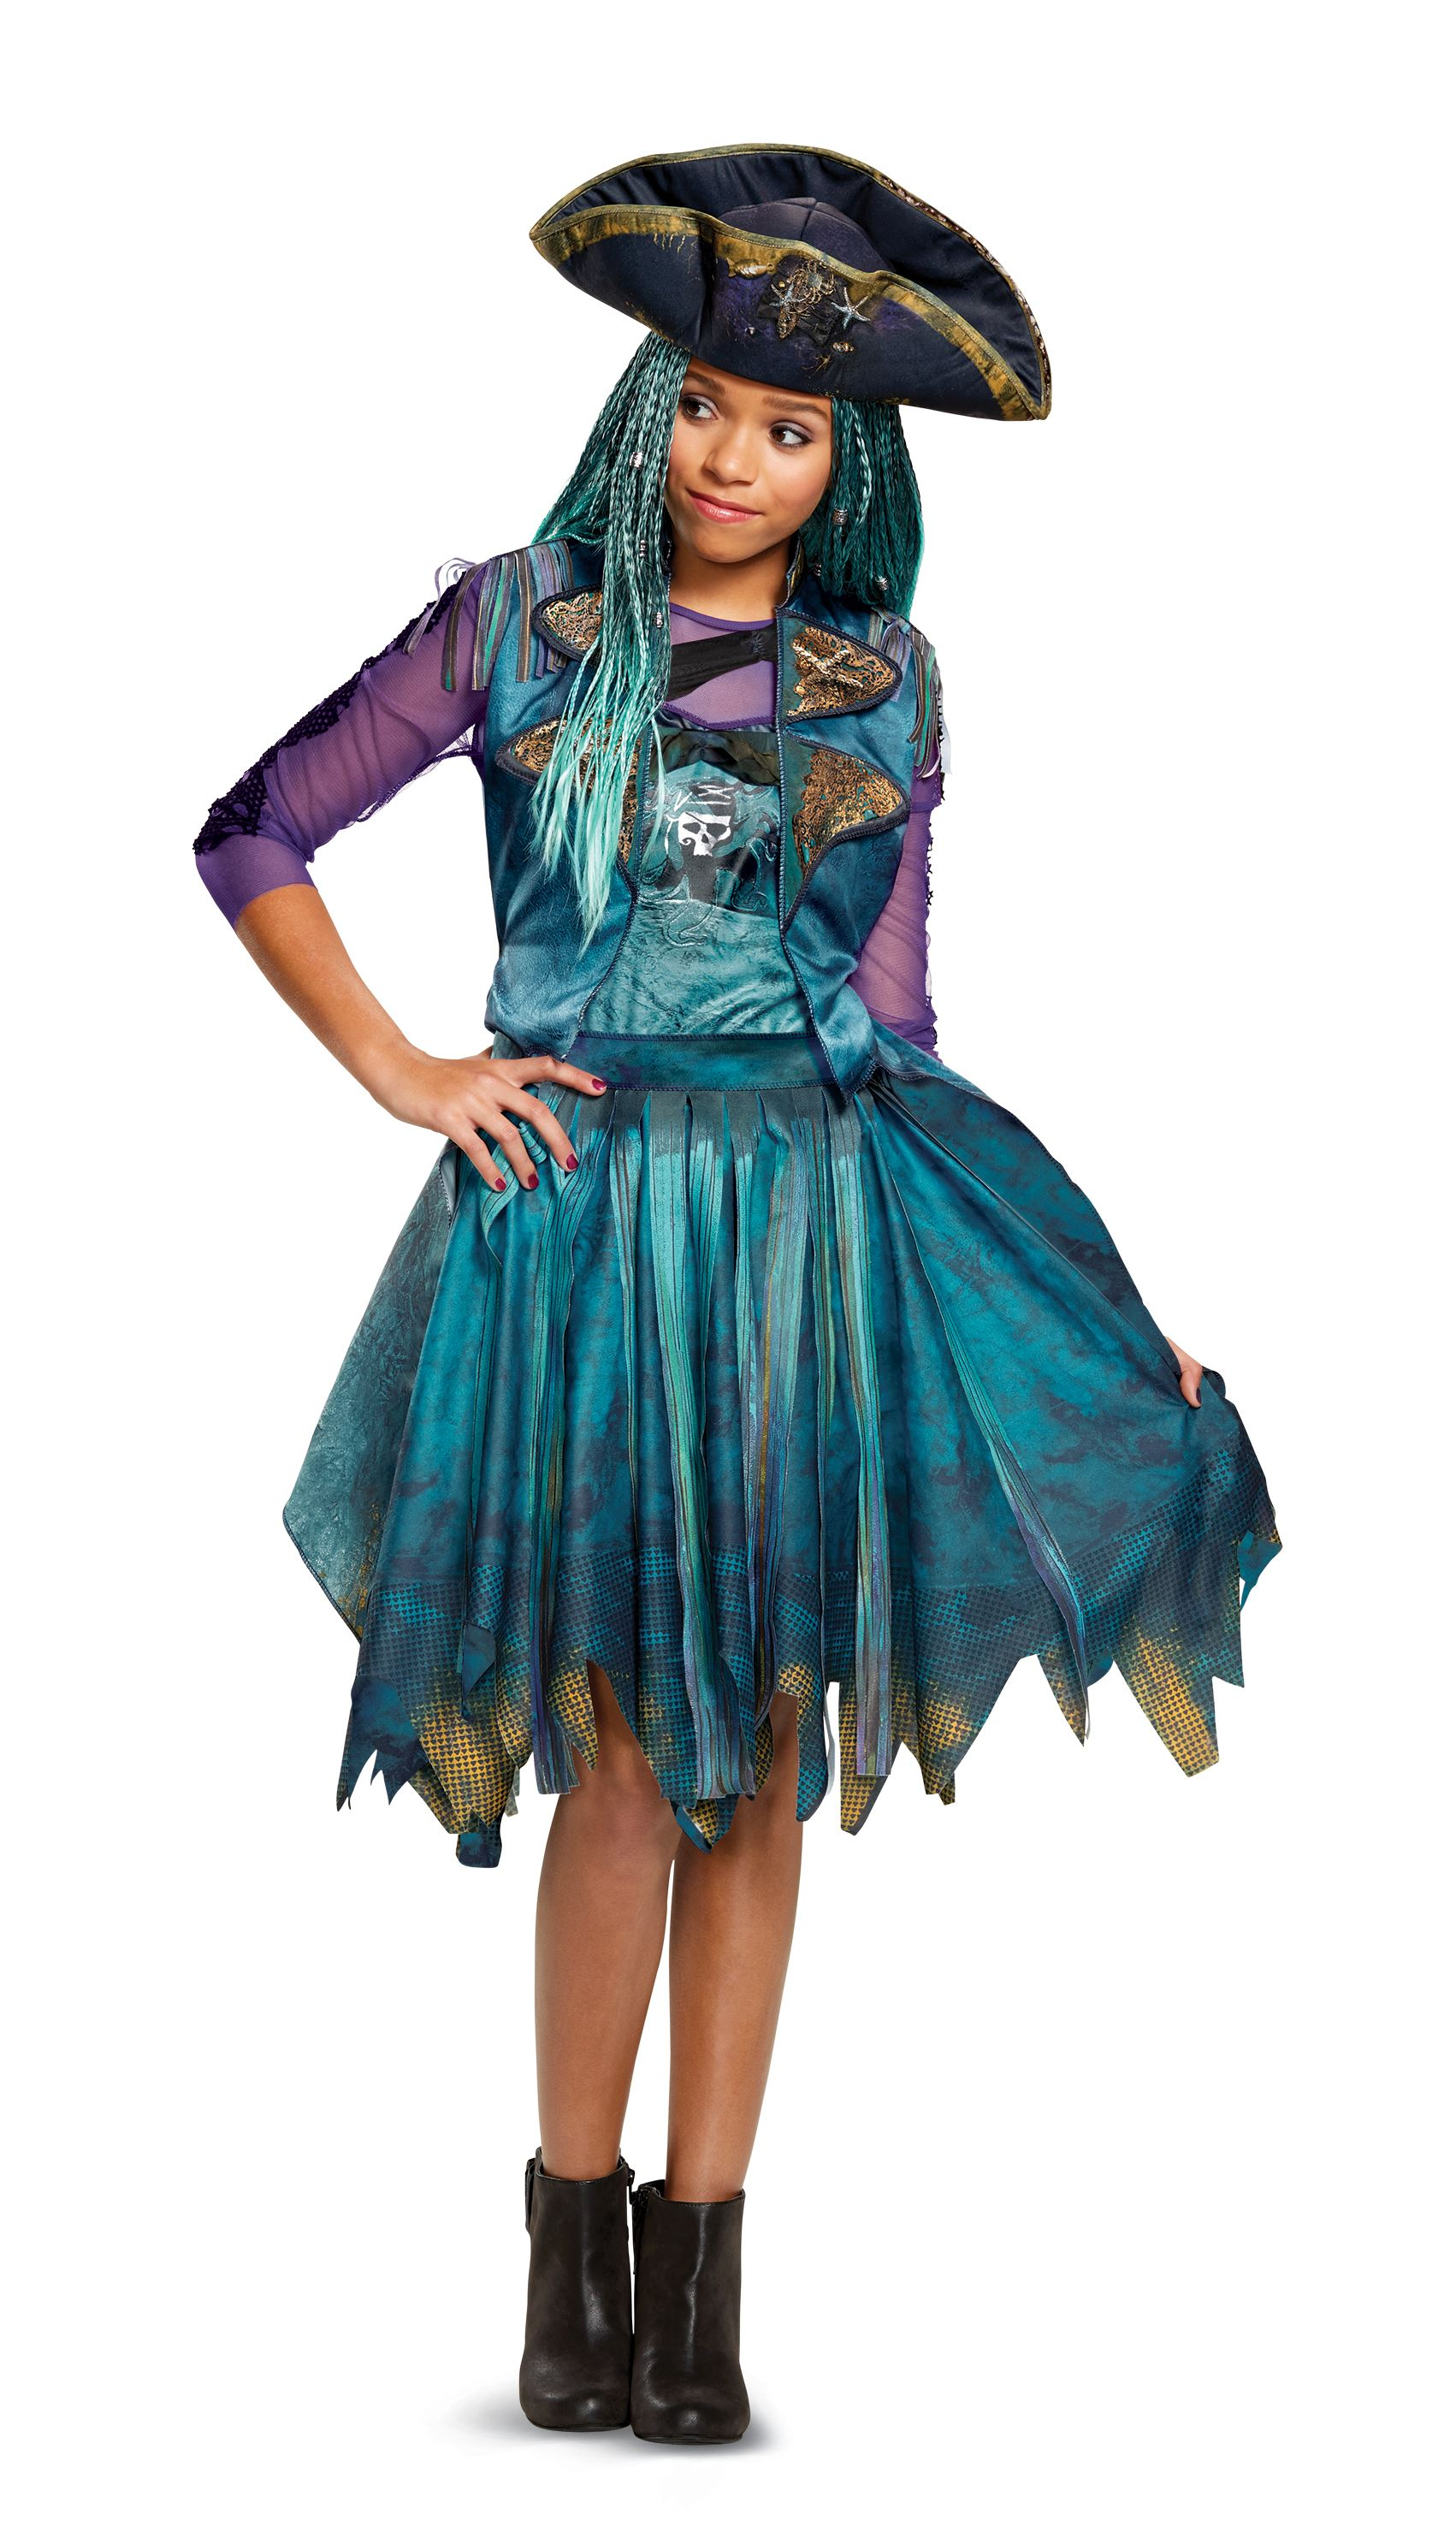 Uma descendants girls halloween costume 44 99 the costume land